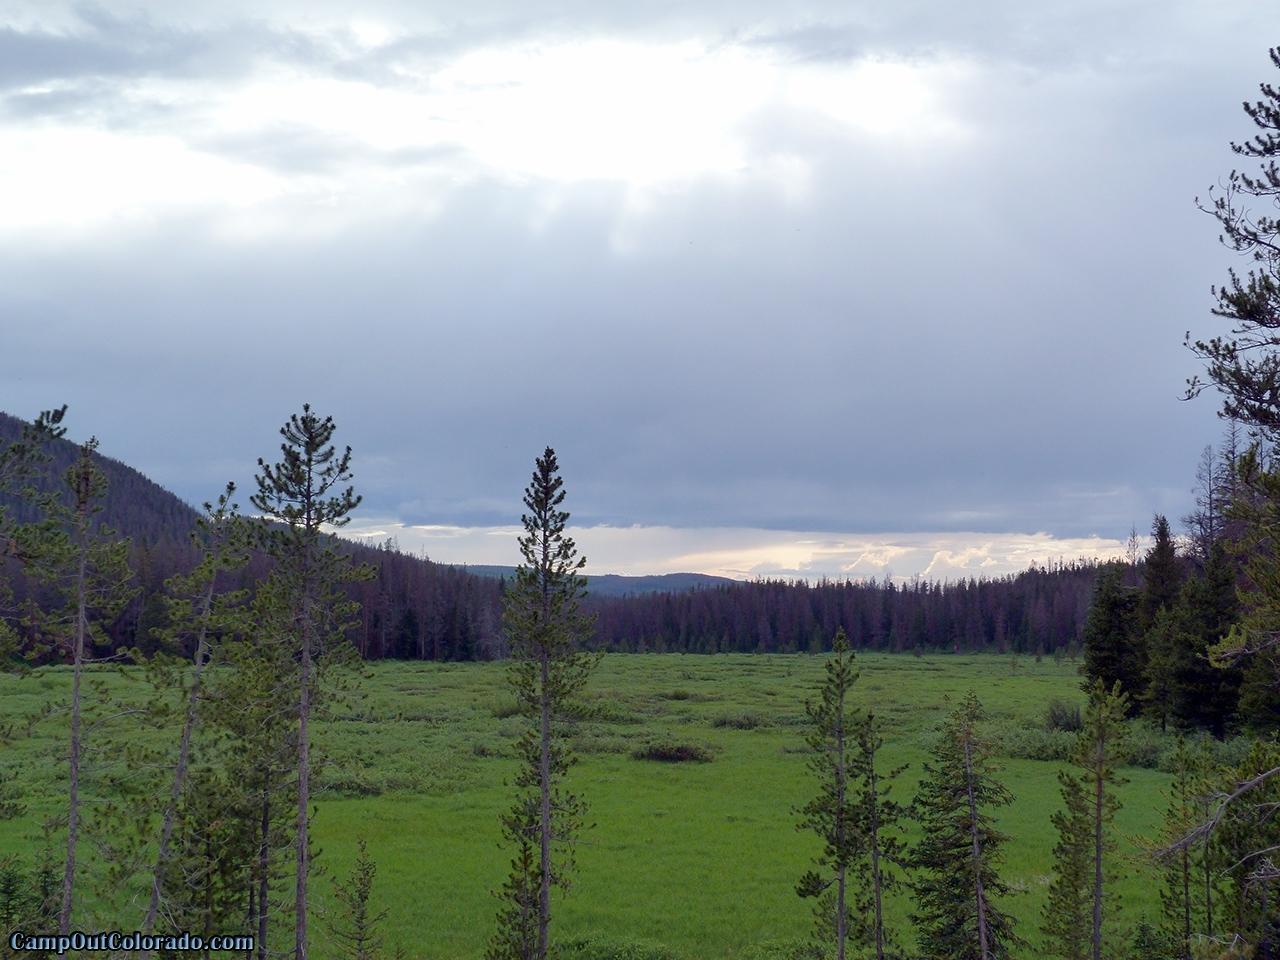 camp-out-colorado-ranger-lakes-campground-moose-meadow.jpg